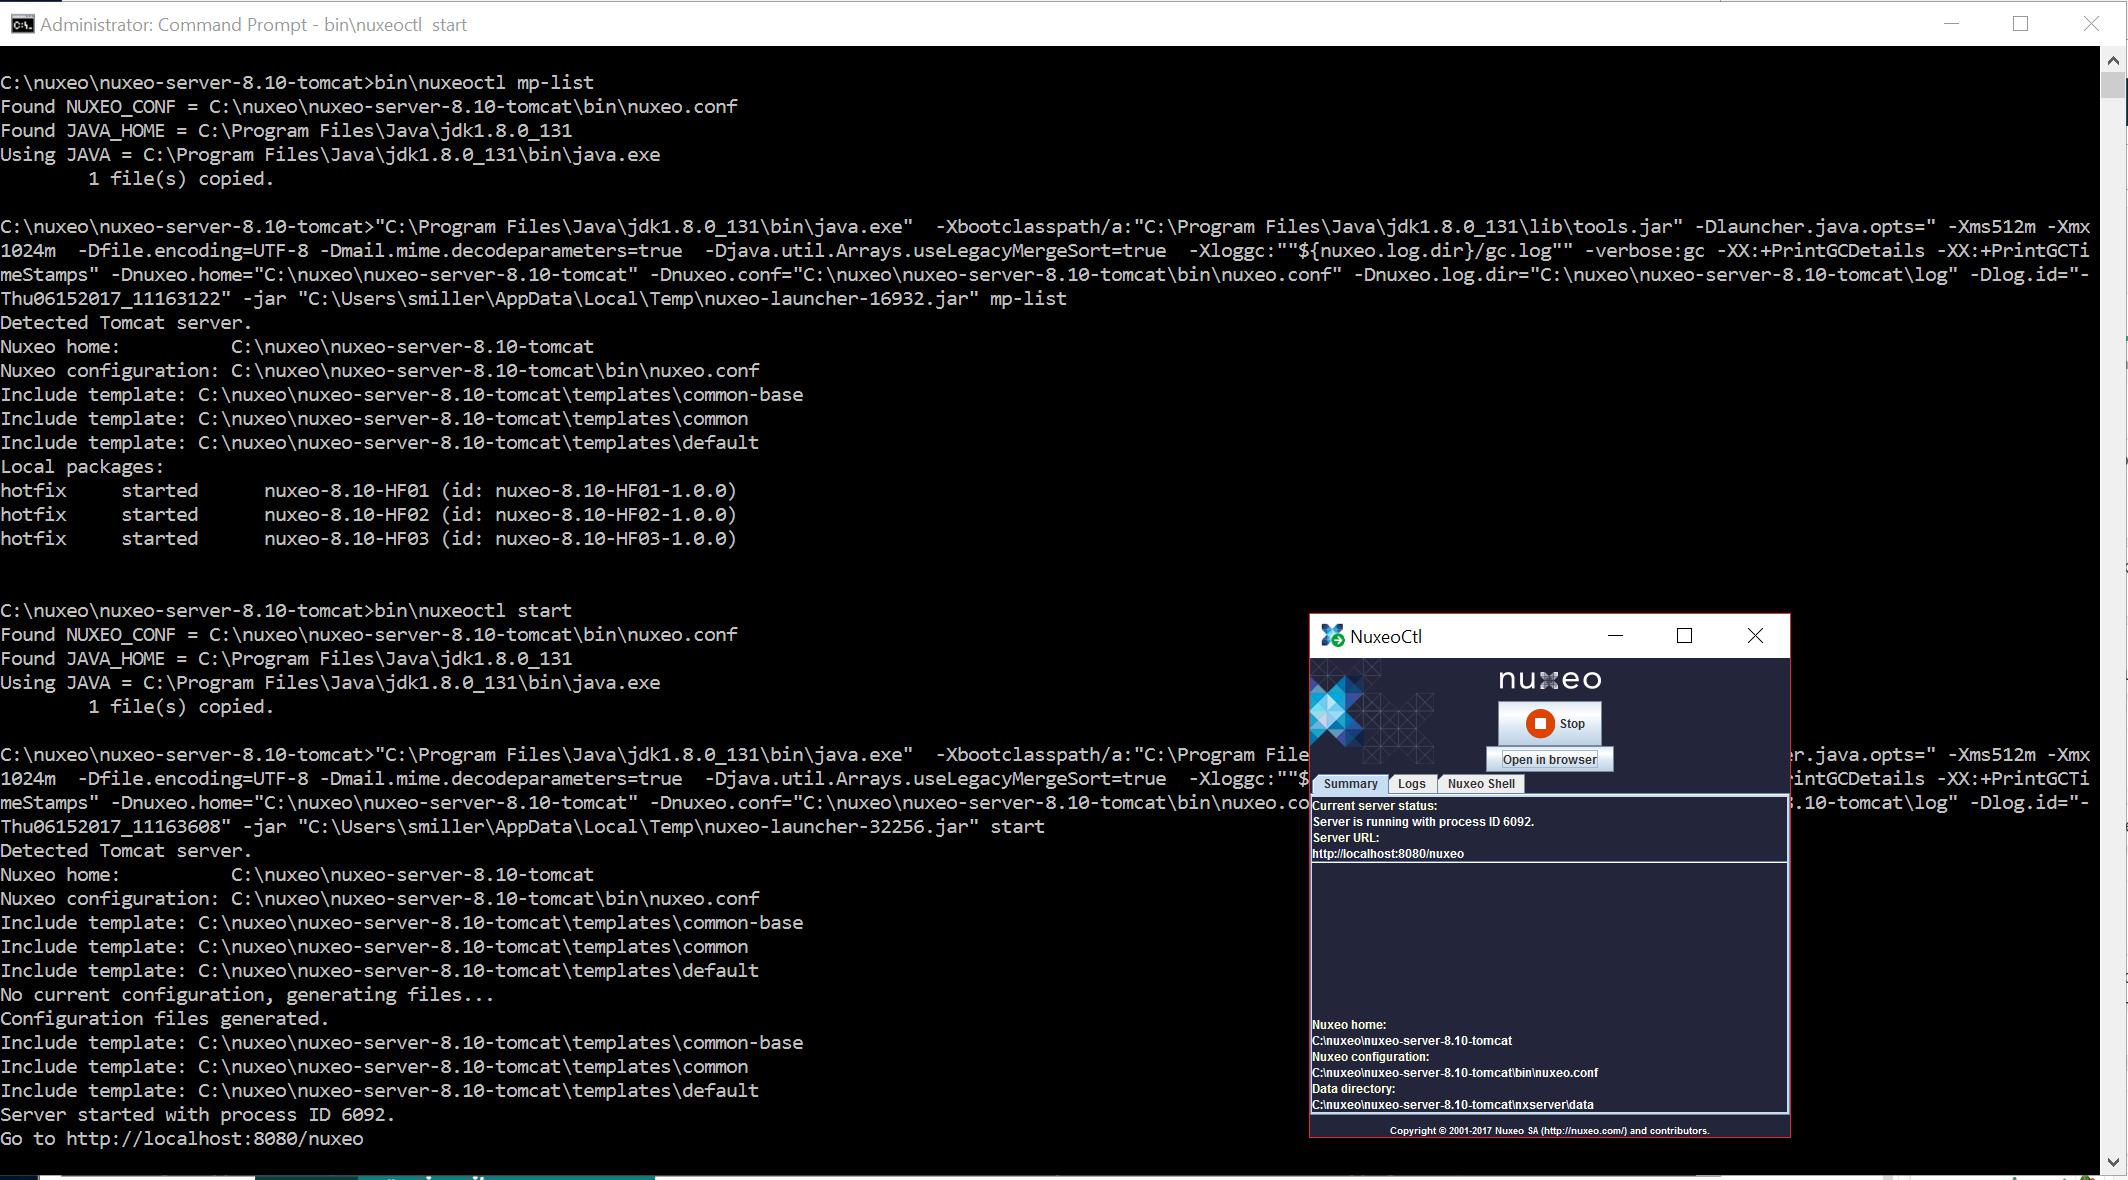 NXP-22552] Under Windows 10 JDK 1 8, tomcat distro cannot bind